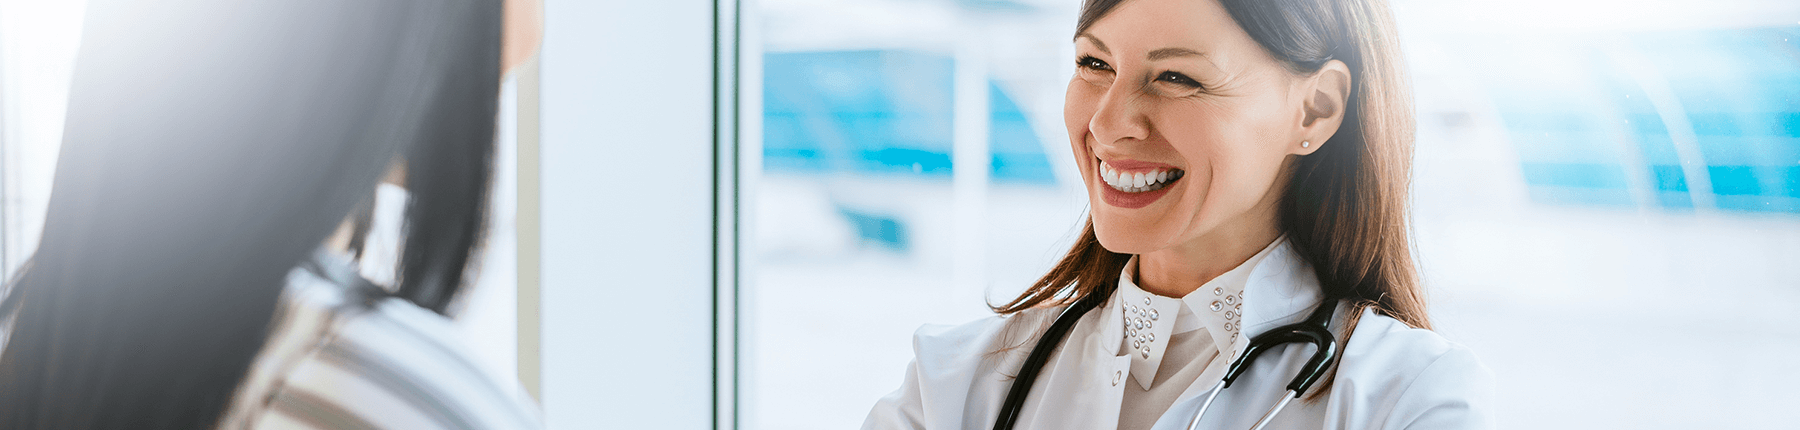 Moderno exame PET-CT PSMA